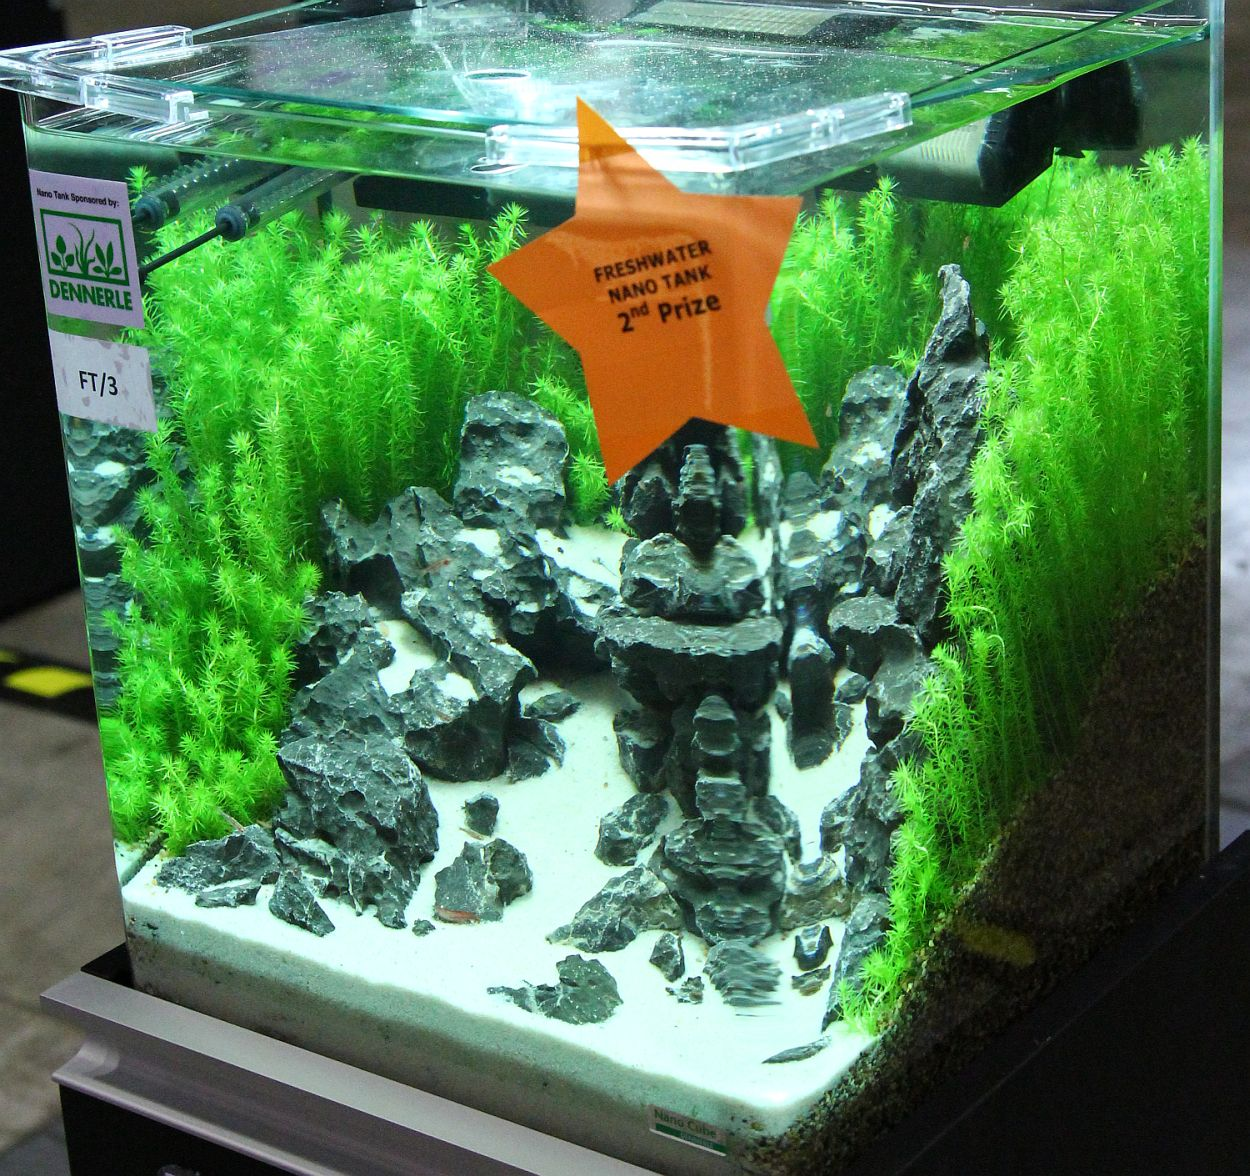 Fish for nano aquarium freshwater - Freshwater Nano Tank 2nd Prize